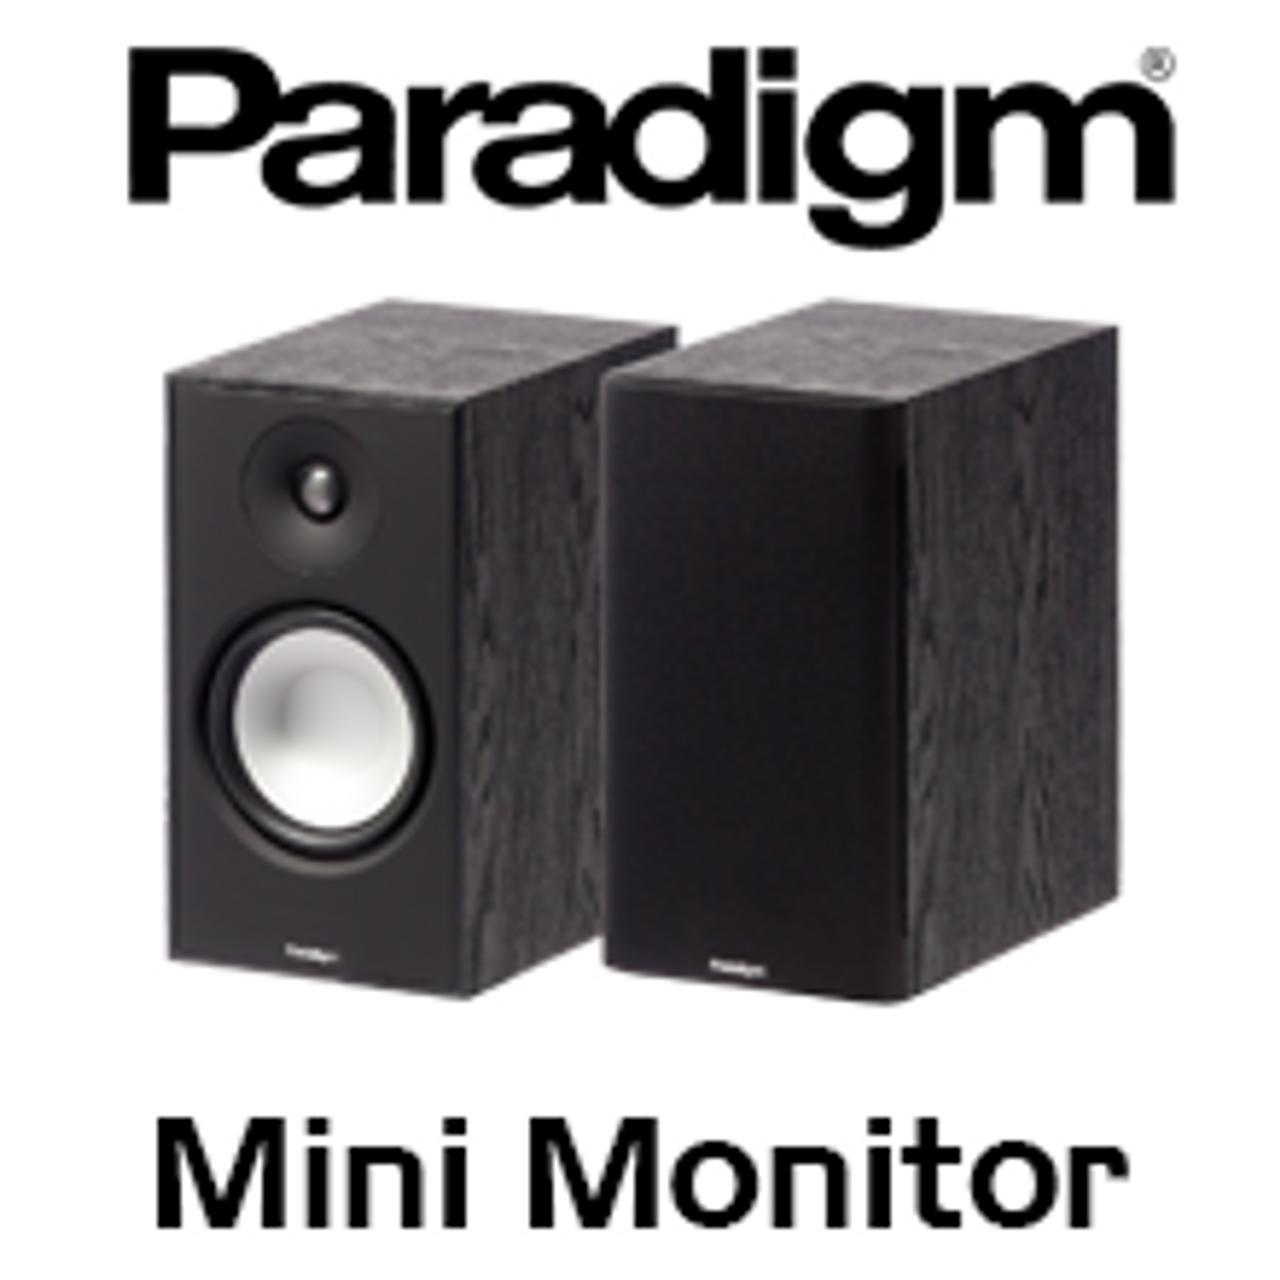 Paradigm Mini Monitor V7 65 2 Way Bass Reflex Bookshelf Speakers